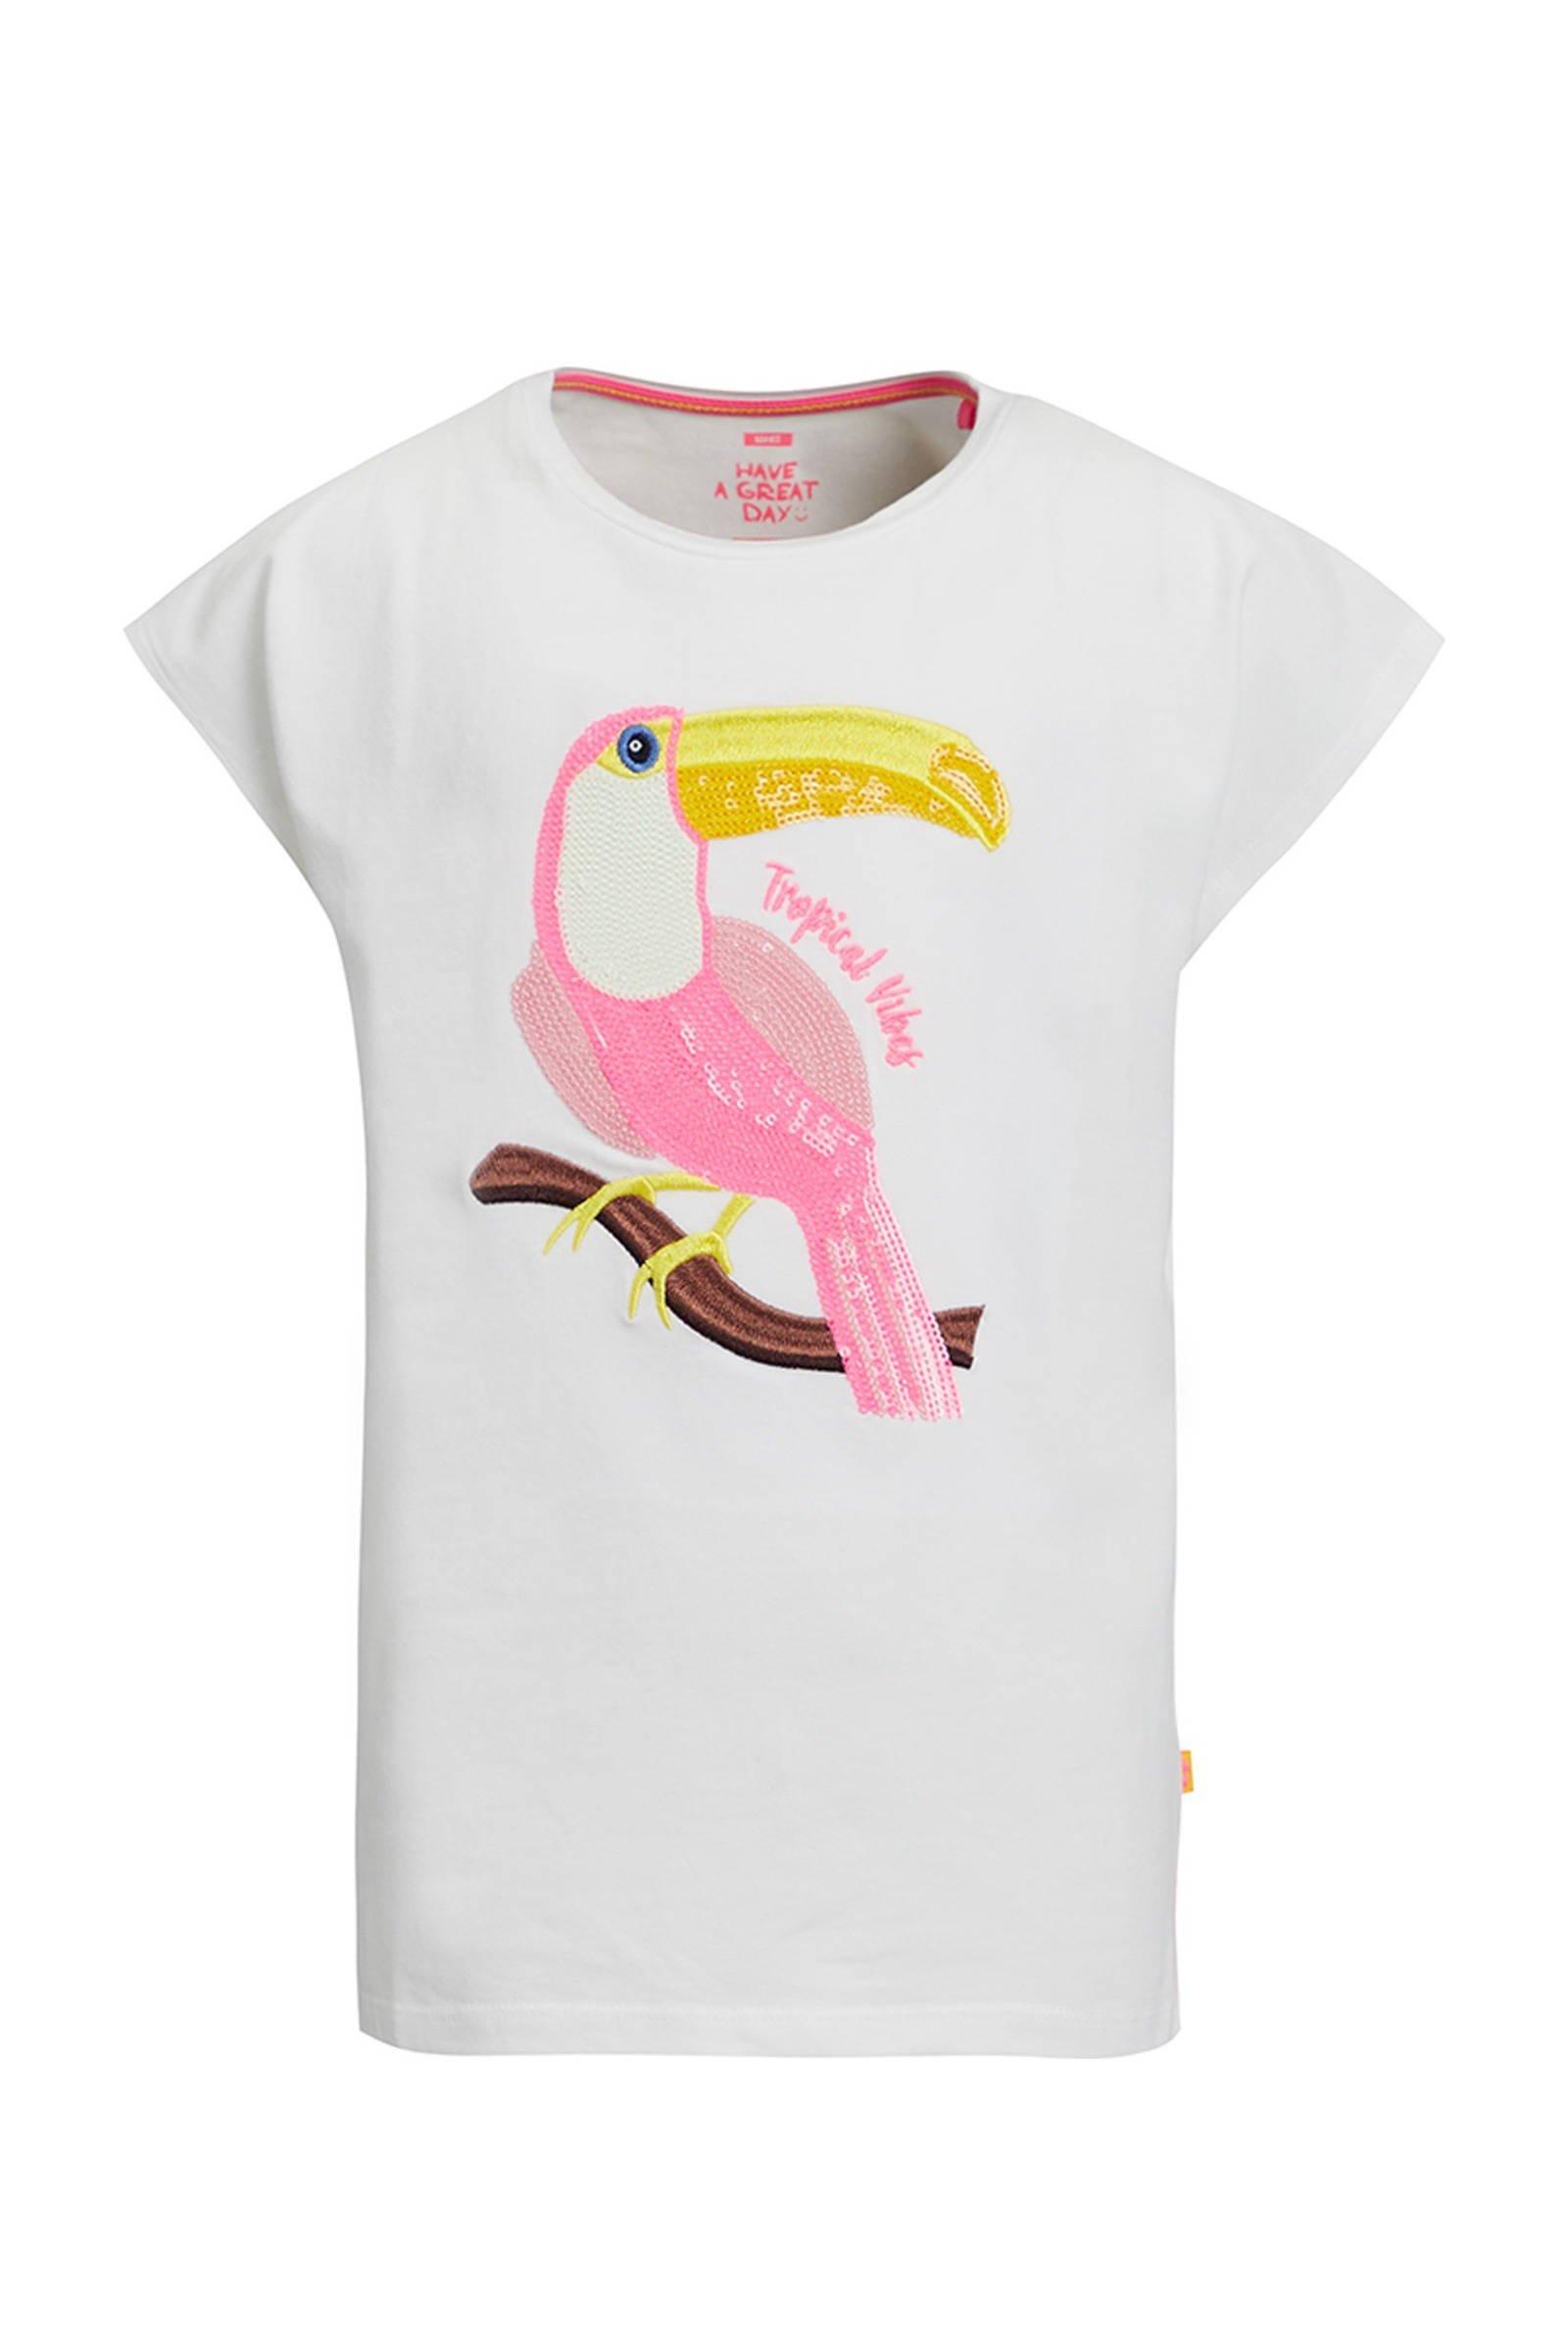 WE Fashion T-shirt met printopdruk en pailletten wit - maat 98/104